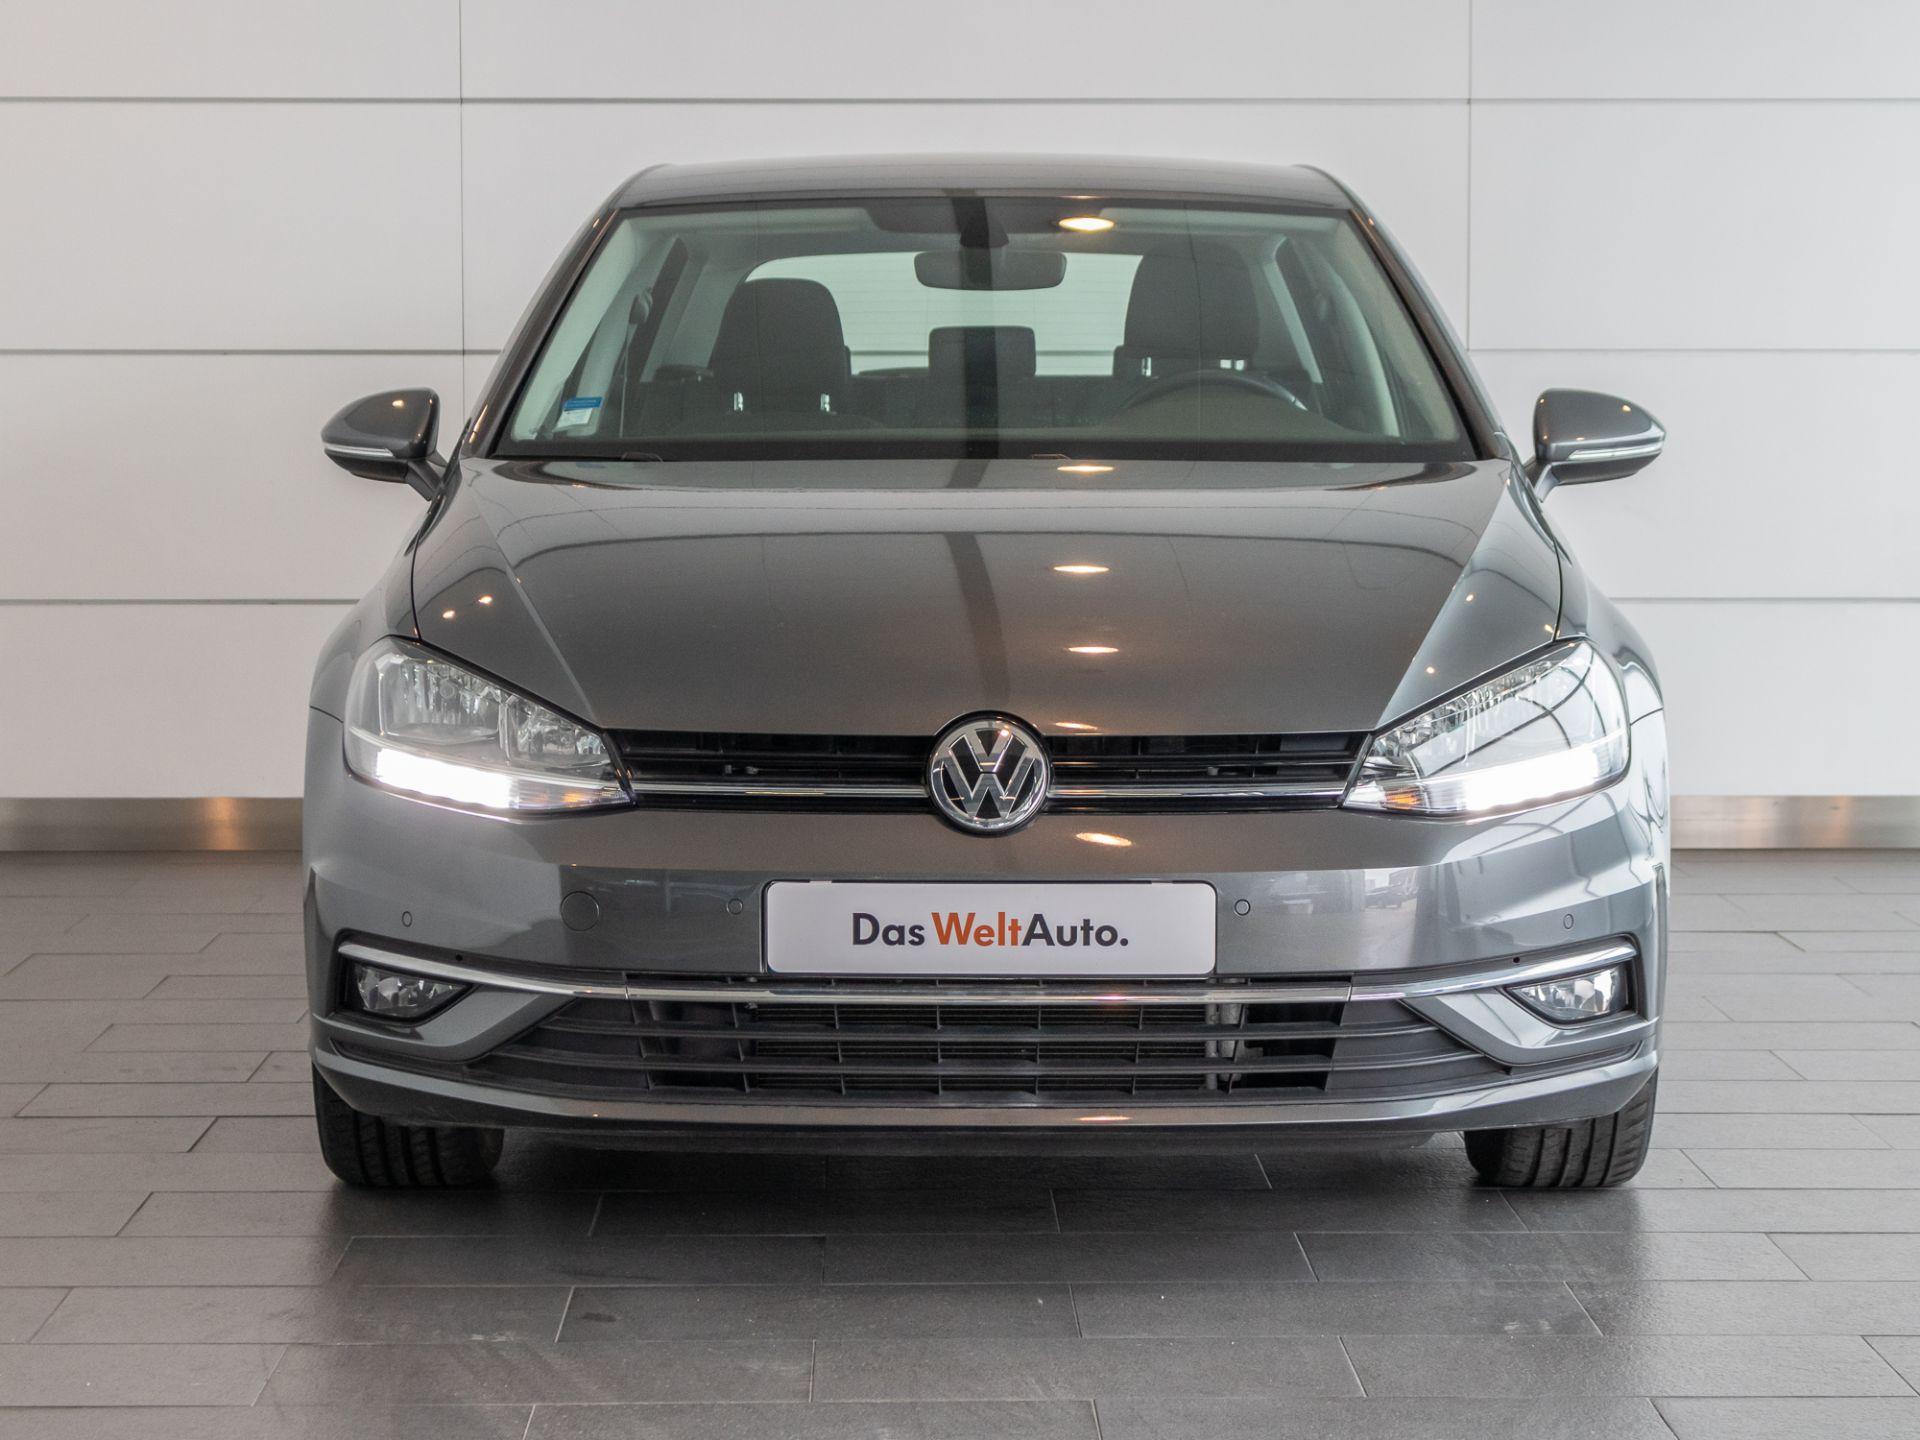 Volkswagen Golf 1.0 TSI 115cv Stream usada Setúbal